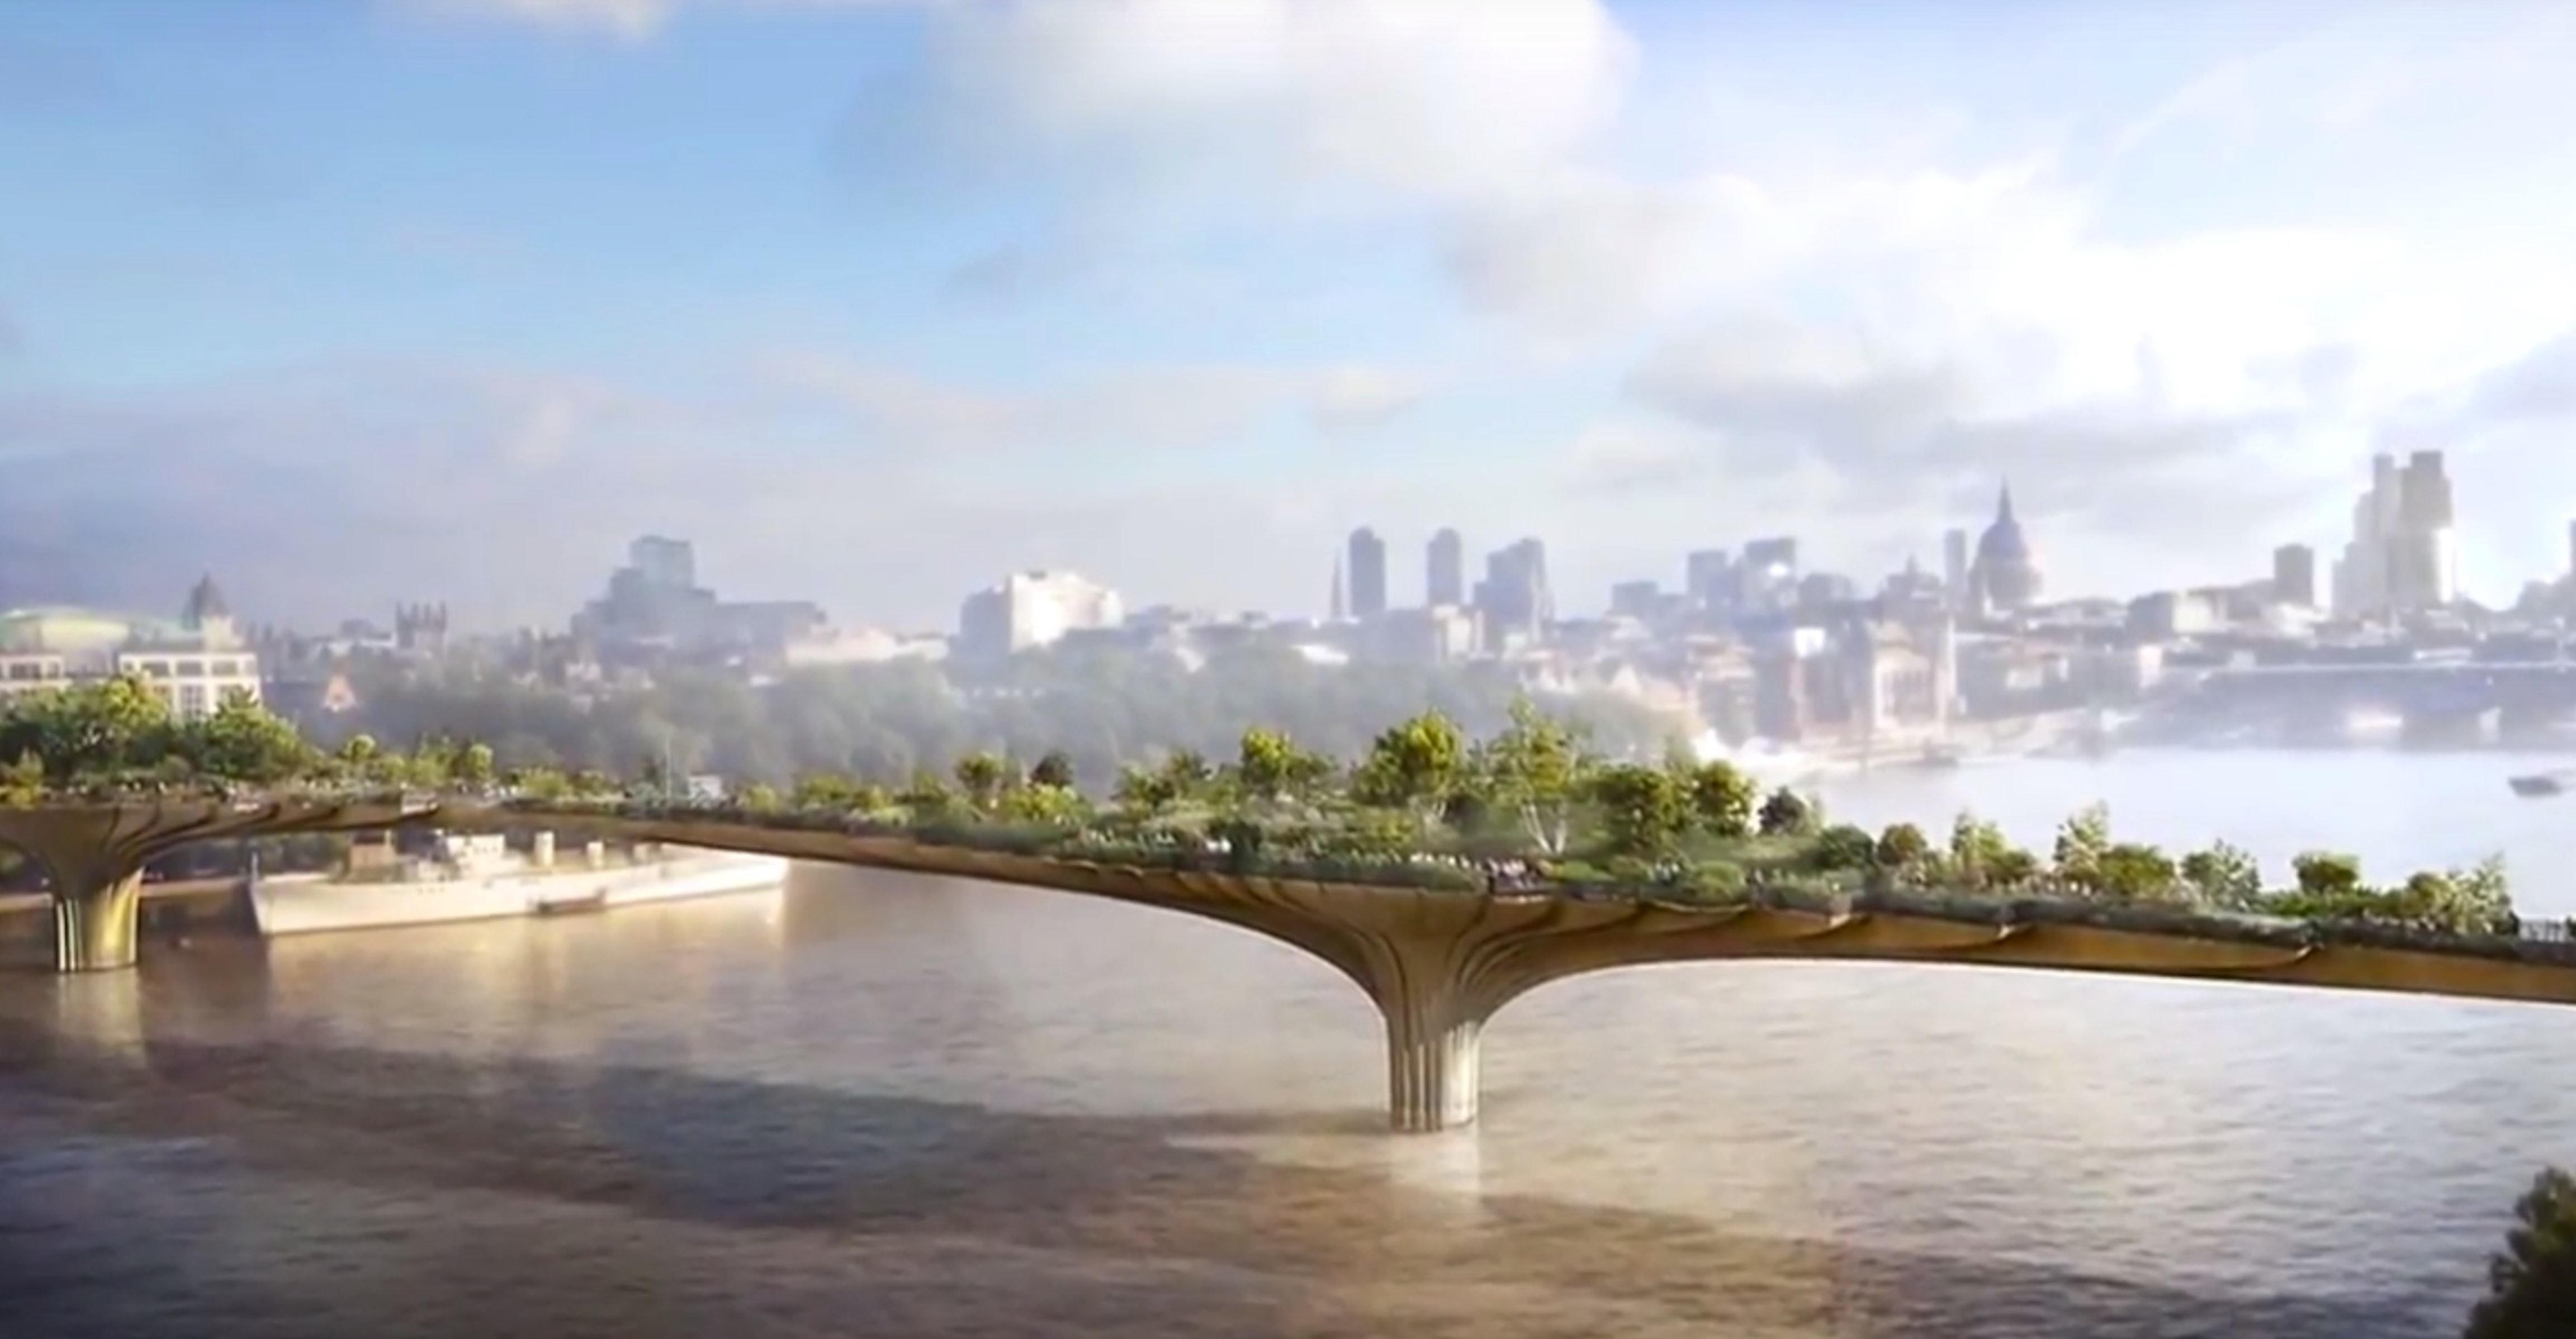 An artist's rendering of the London Garden Bridge